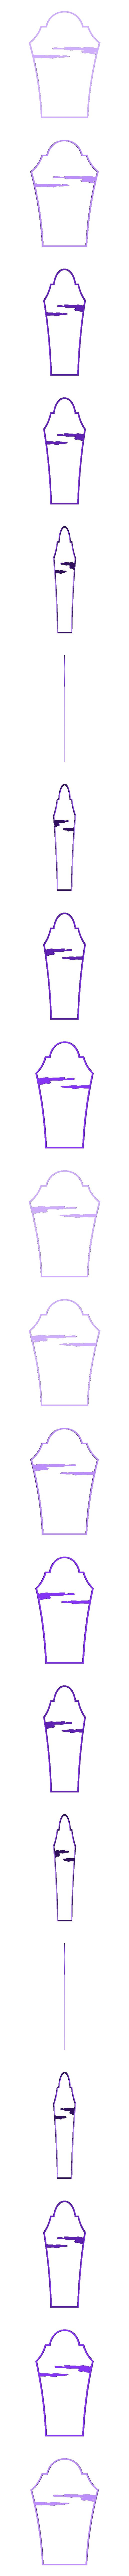 Layer_1_CLOUDS.stl Download free STL file HALLOWEEN Depth Silhouette Gravestone • Model to 3D print, Grafit